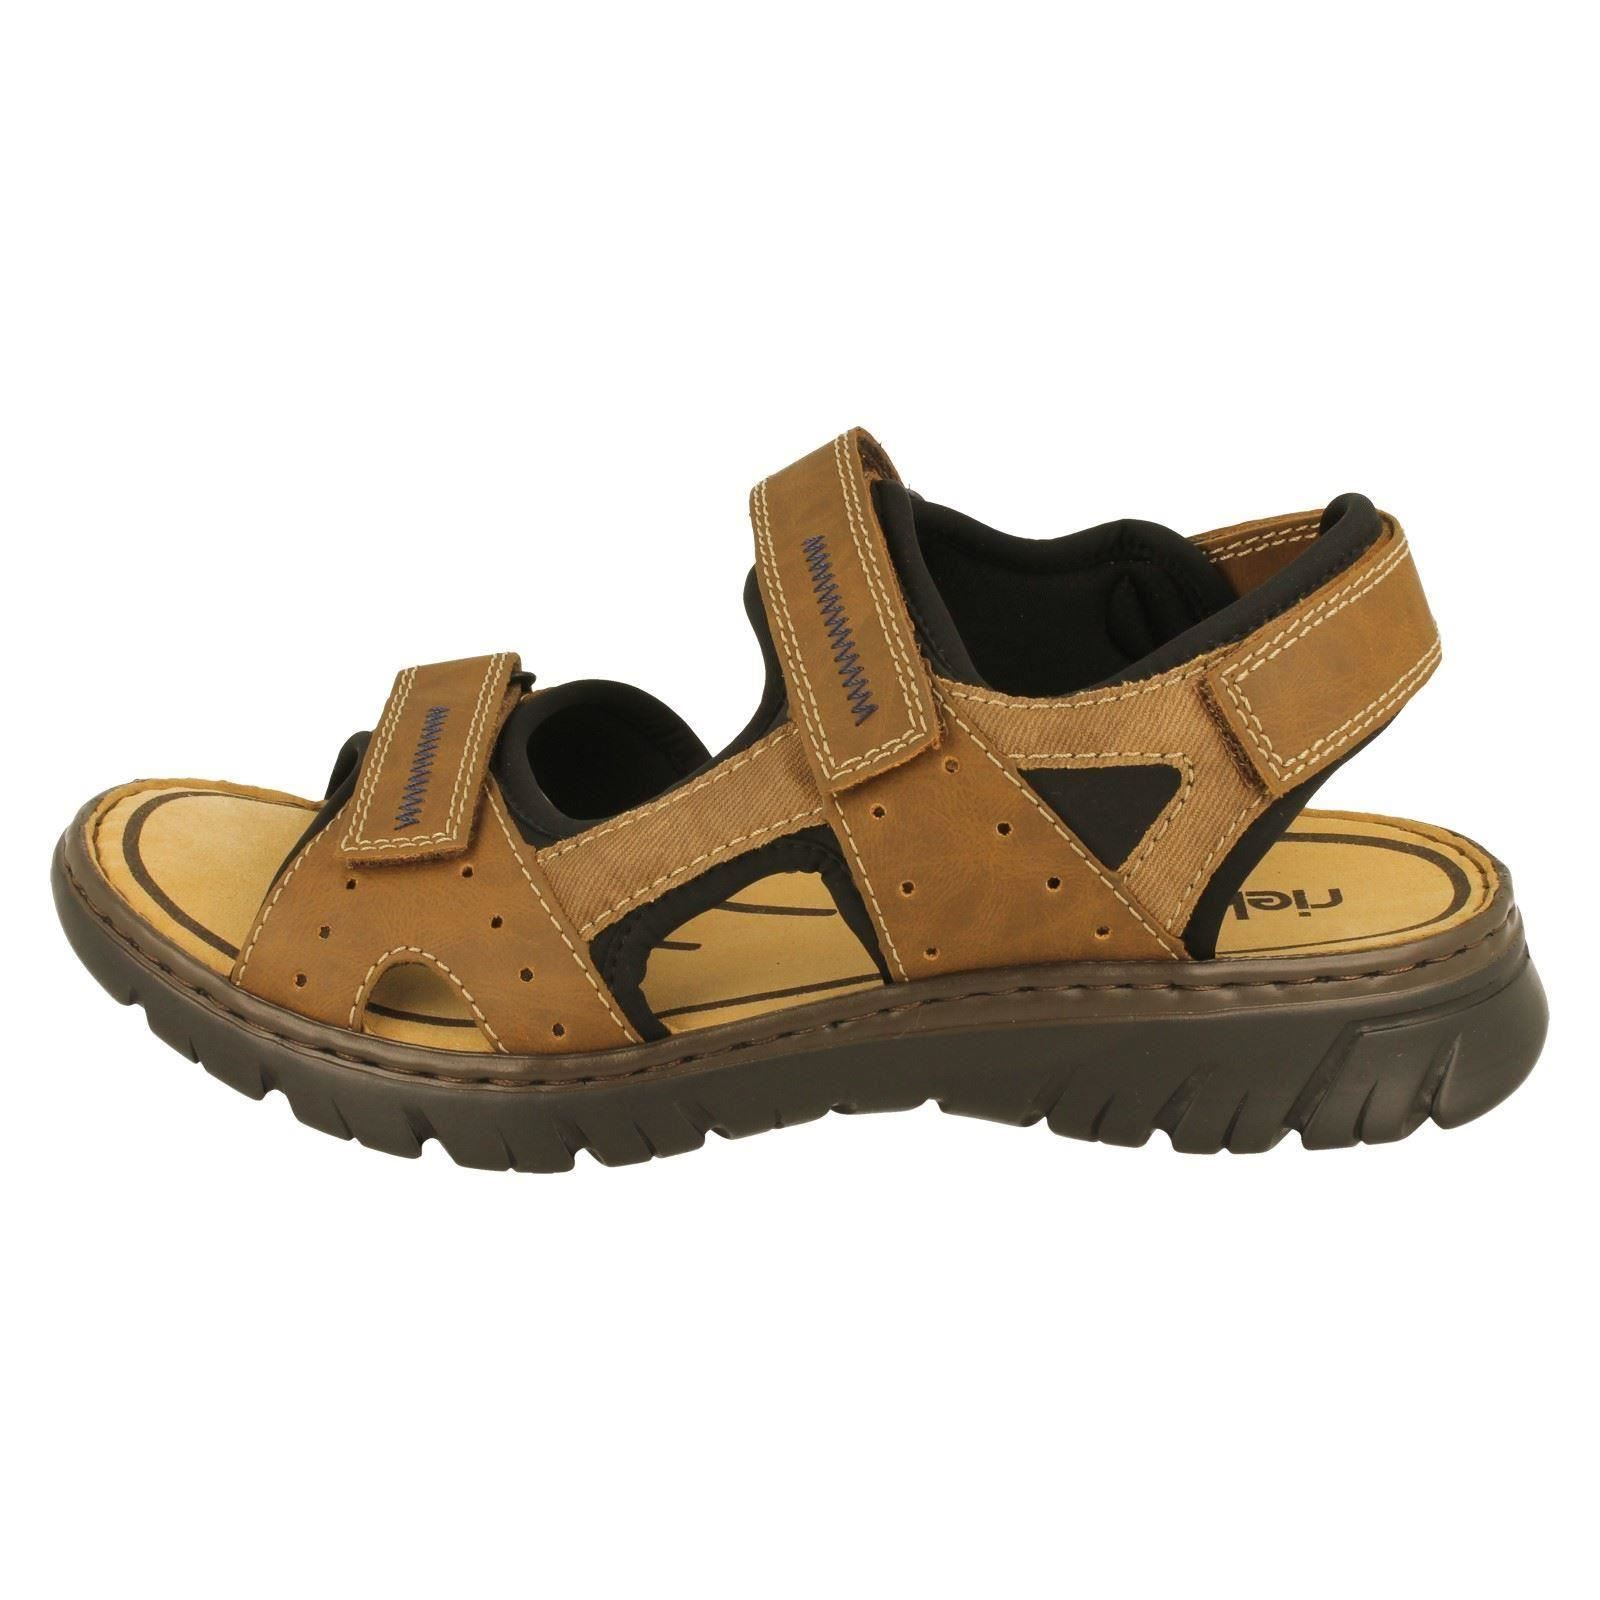 Uomo Rieker Sandales Style 26757 - 26757 Style 930507